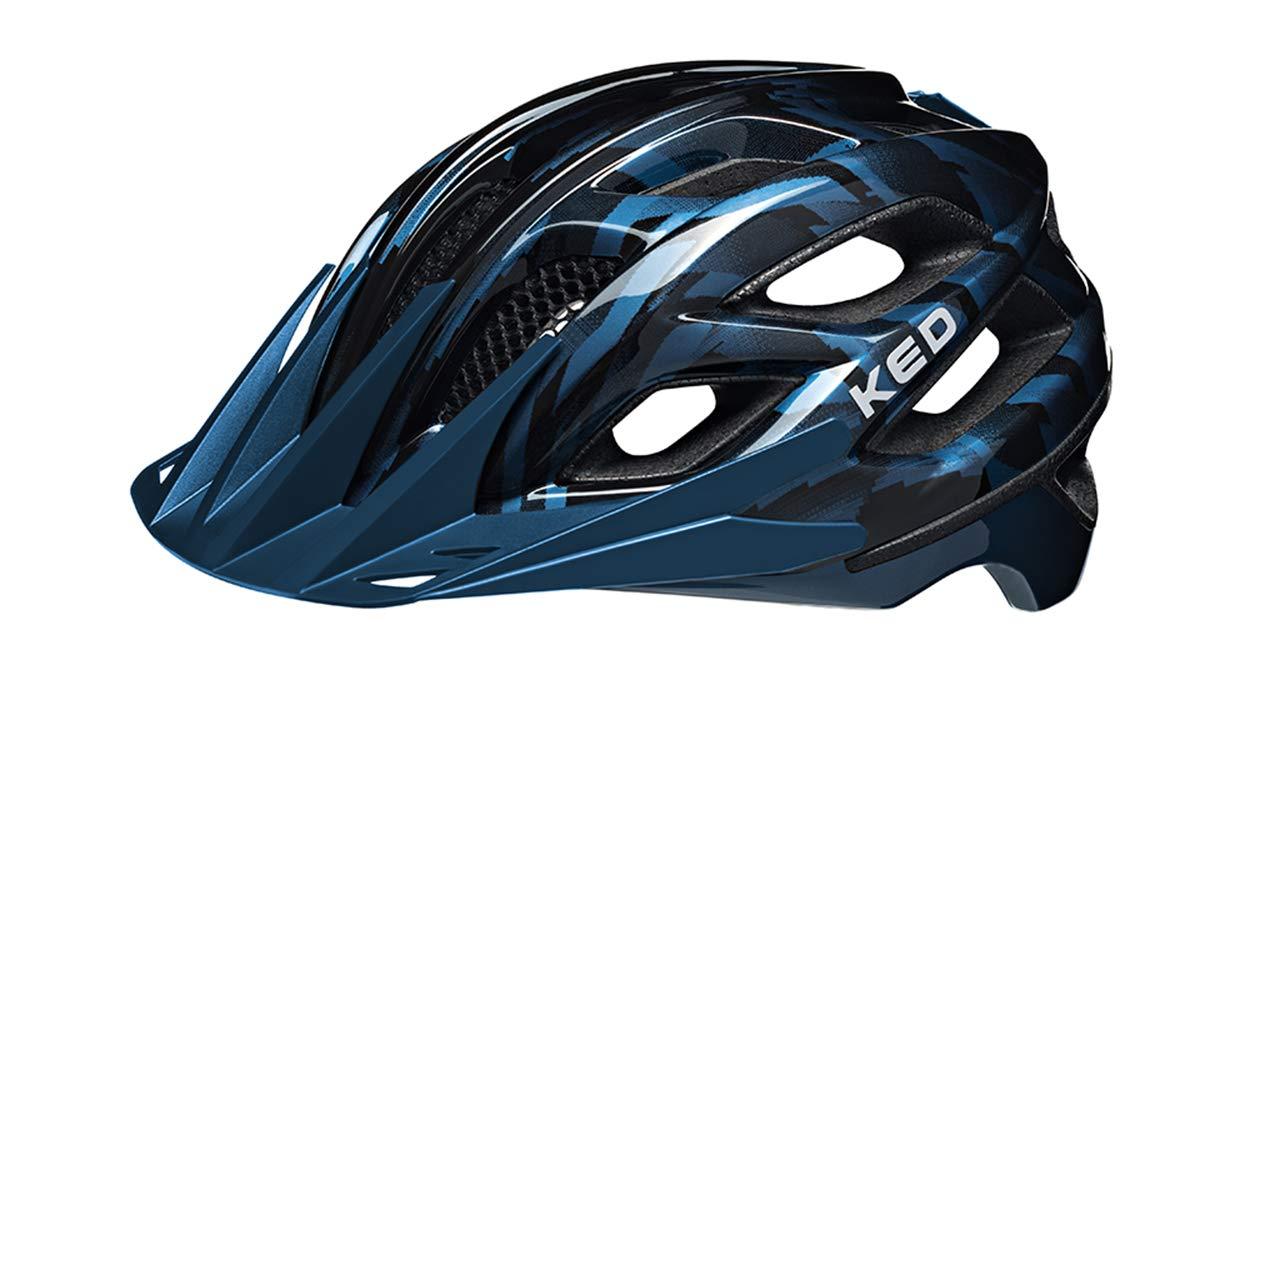 KED Companion Helmet schwarz Blau 2019 Fahrradhelm